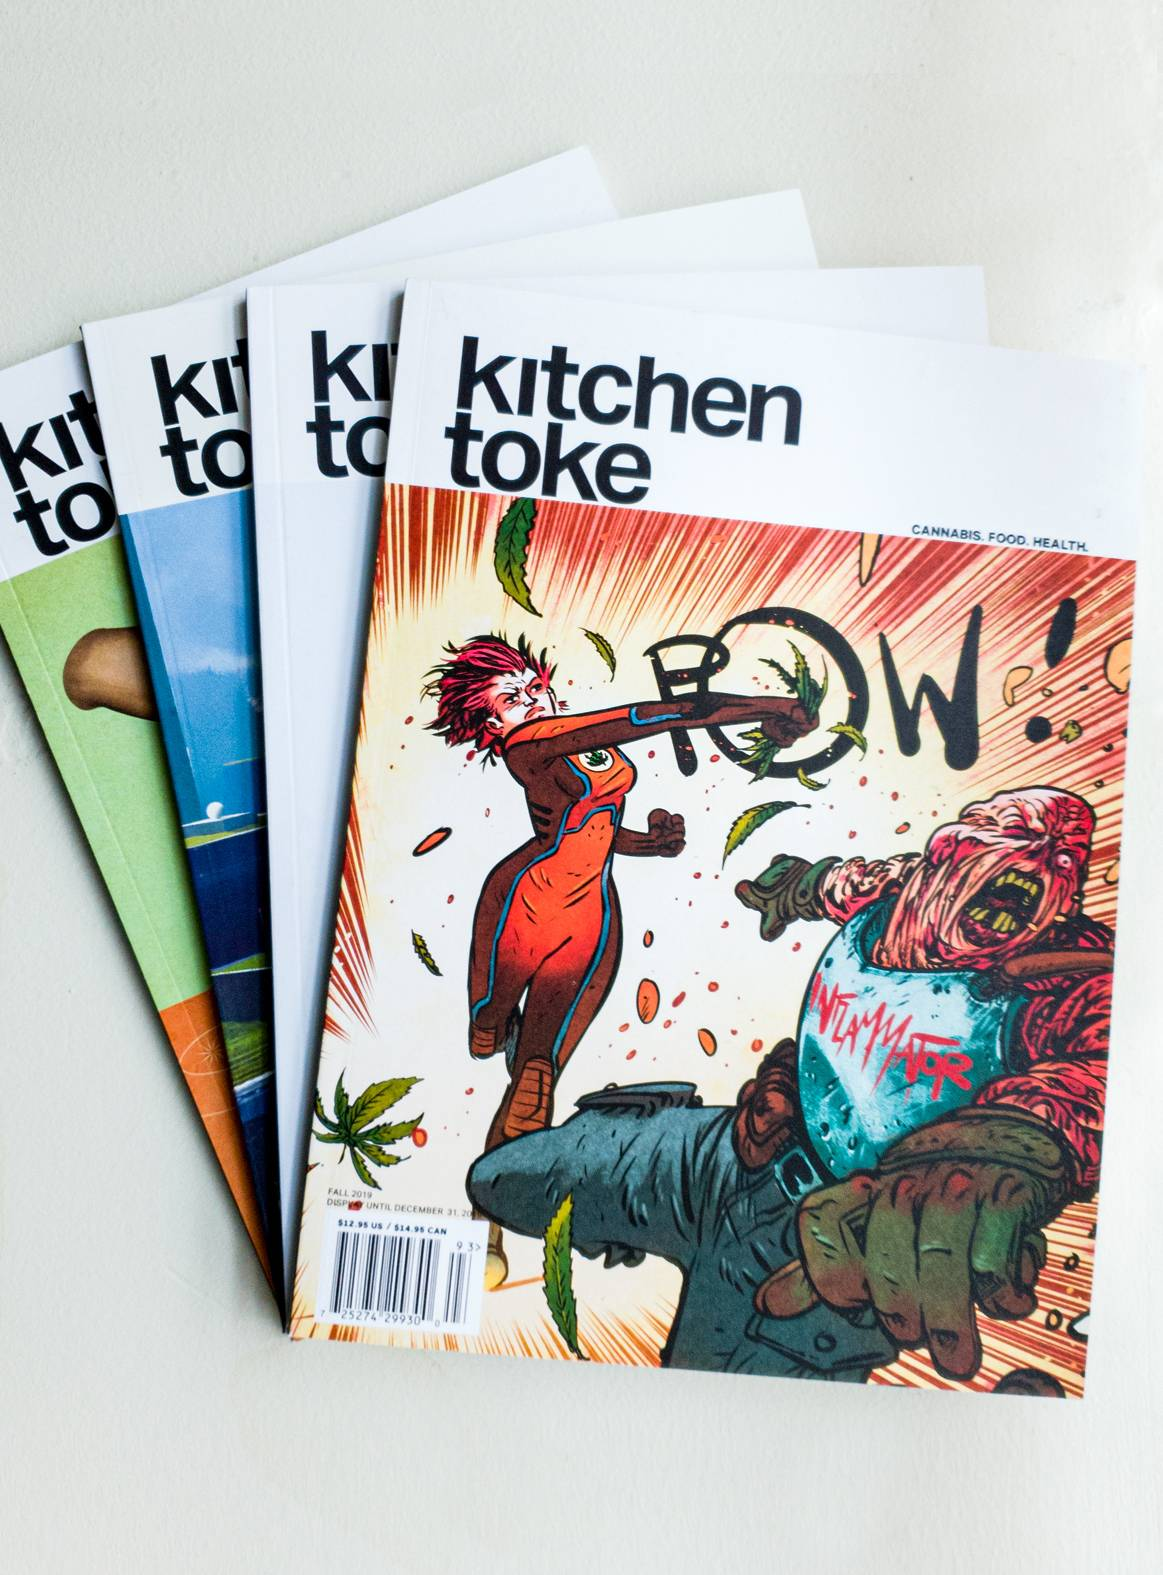 Subscribe to Kitchen Toke magazine